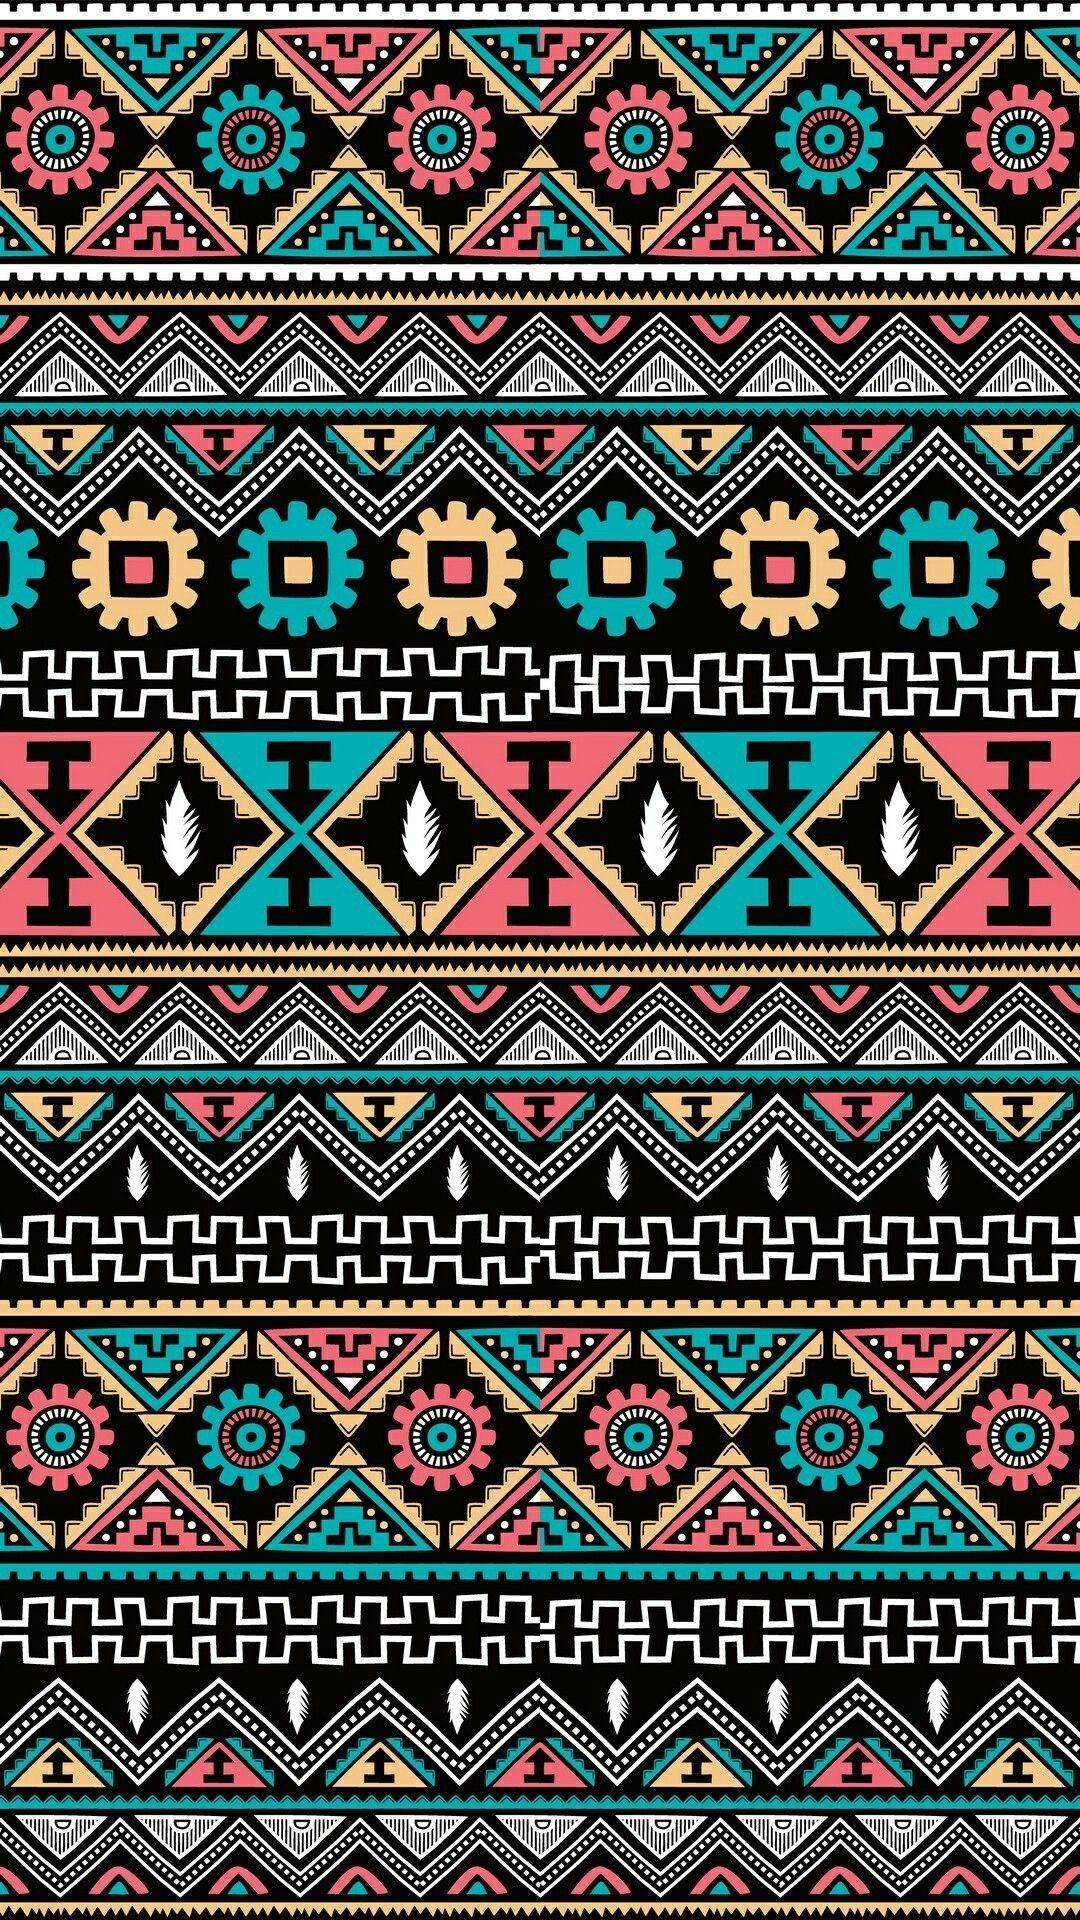 Elegant Tribal Pattern Iphone Wallpaper Aztec Wallpaper Chevron Wallpaper Aztec Phone Wallpaper